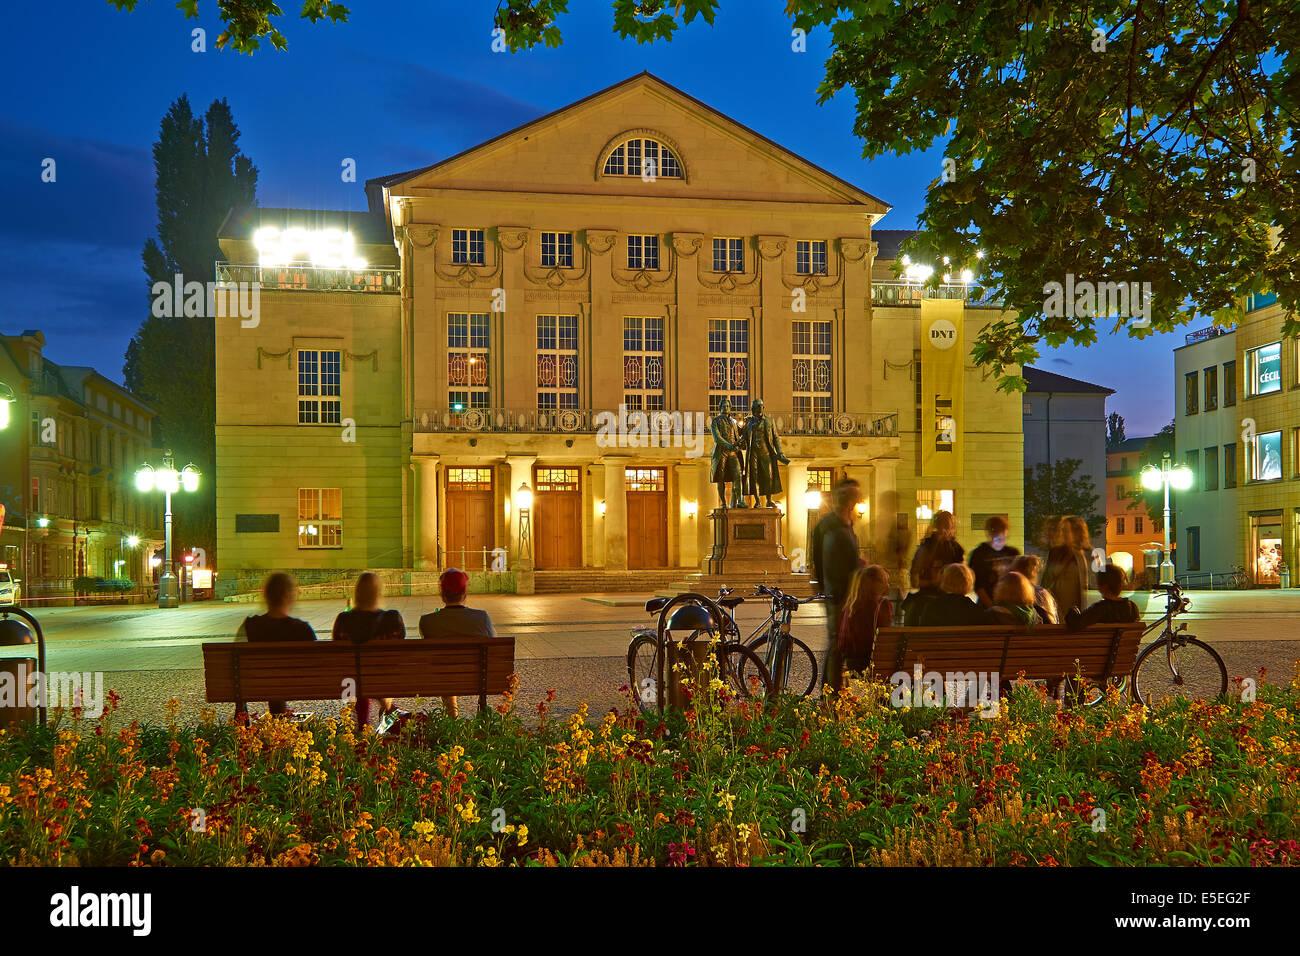 Deutsches Nationaltheater Weimar with Goethe-Schiller Monument, Germany - Stock Image